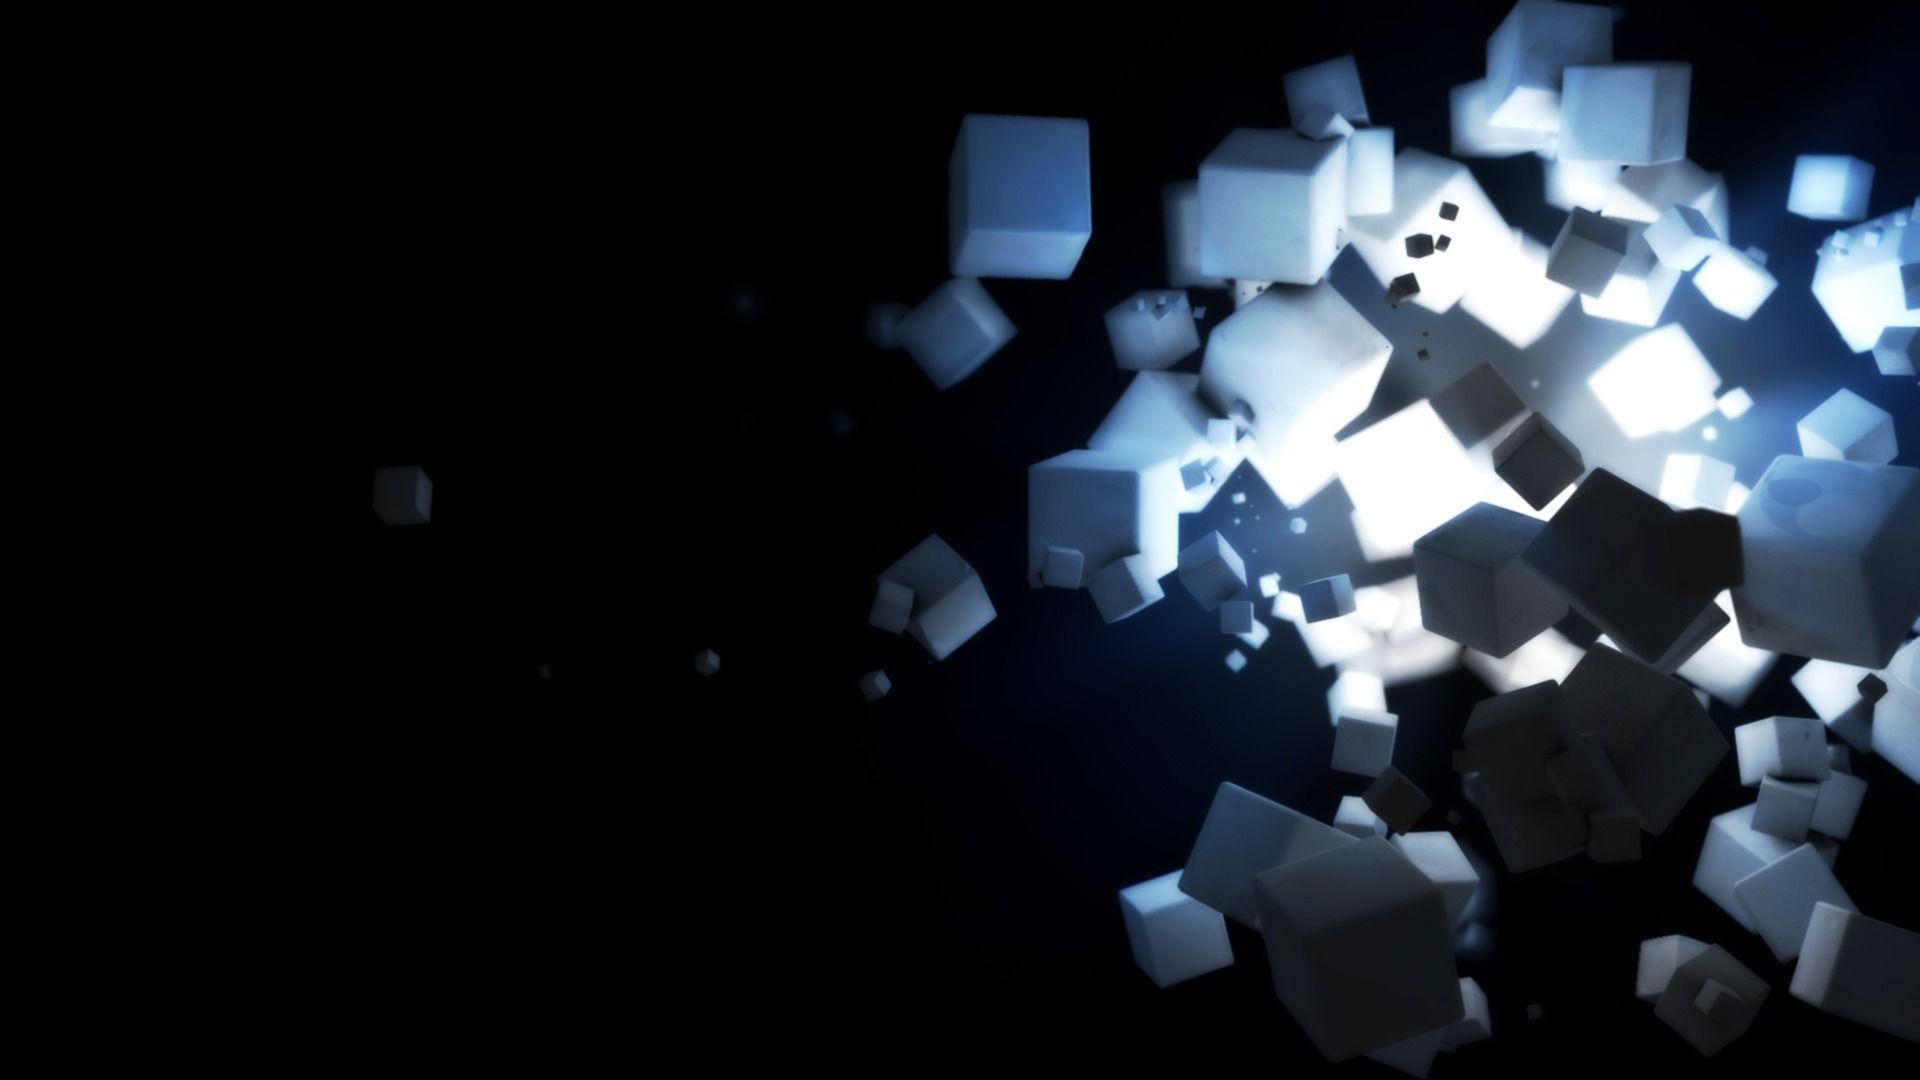 PS3 HD Wallpapers  Wallpaper Cave